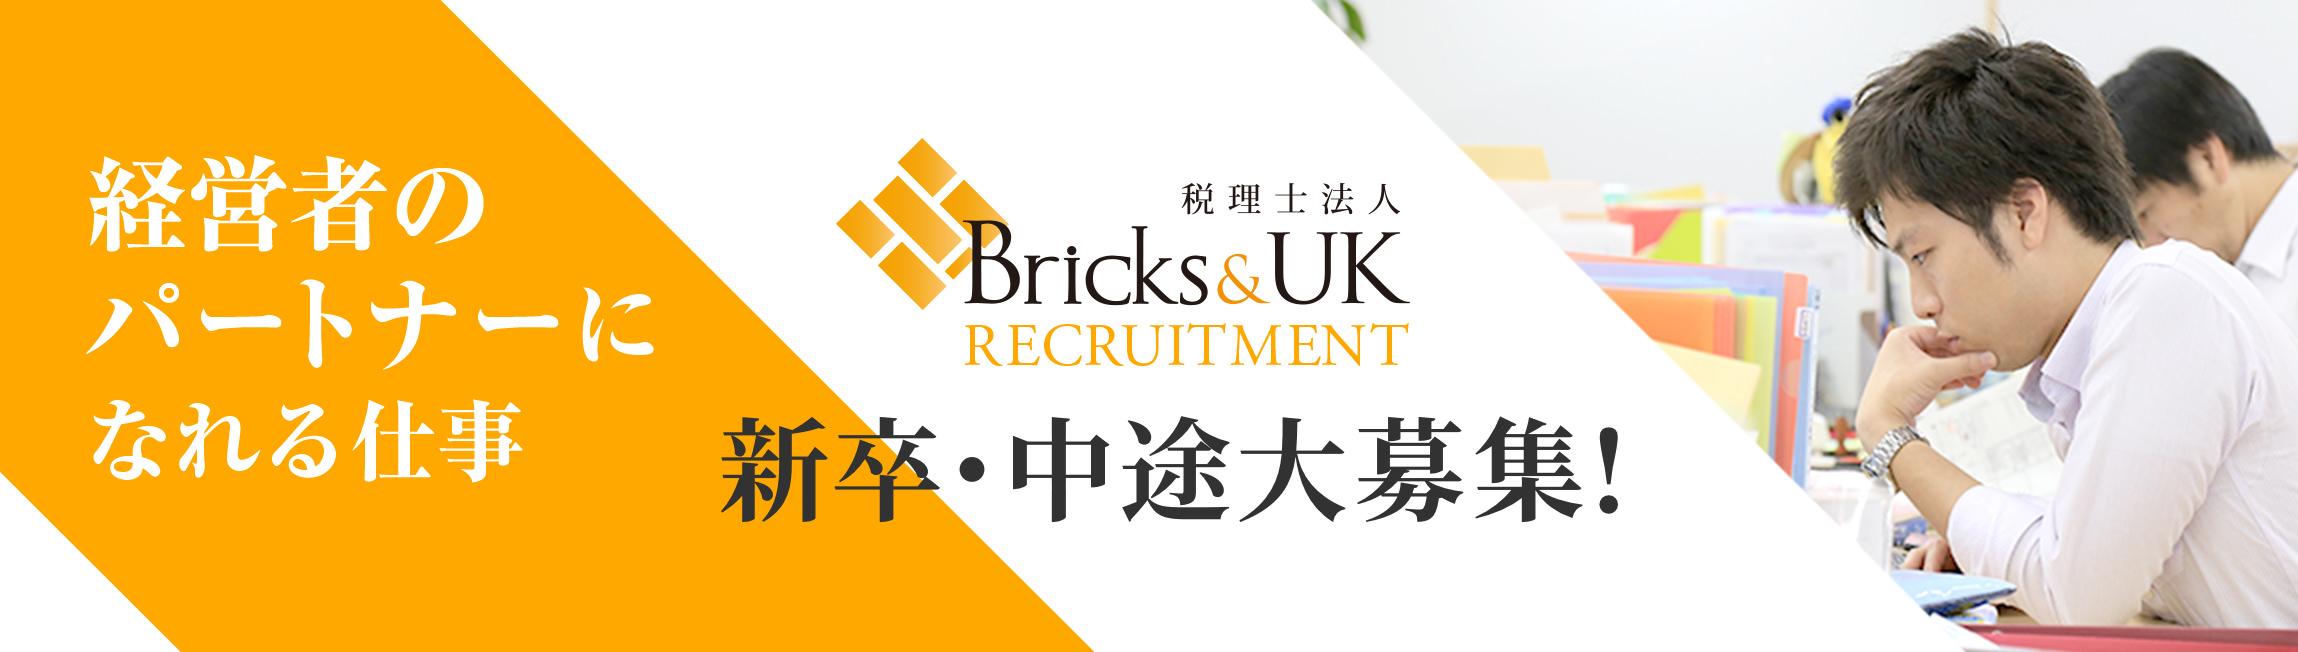 Bricks&UK 採用情報